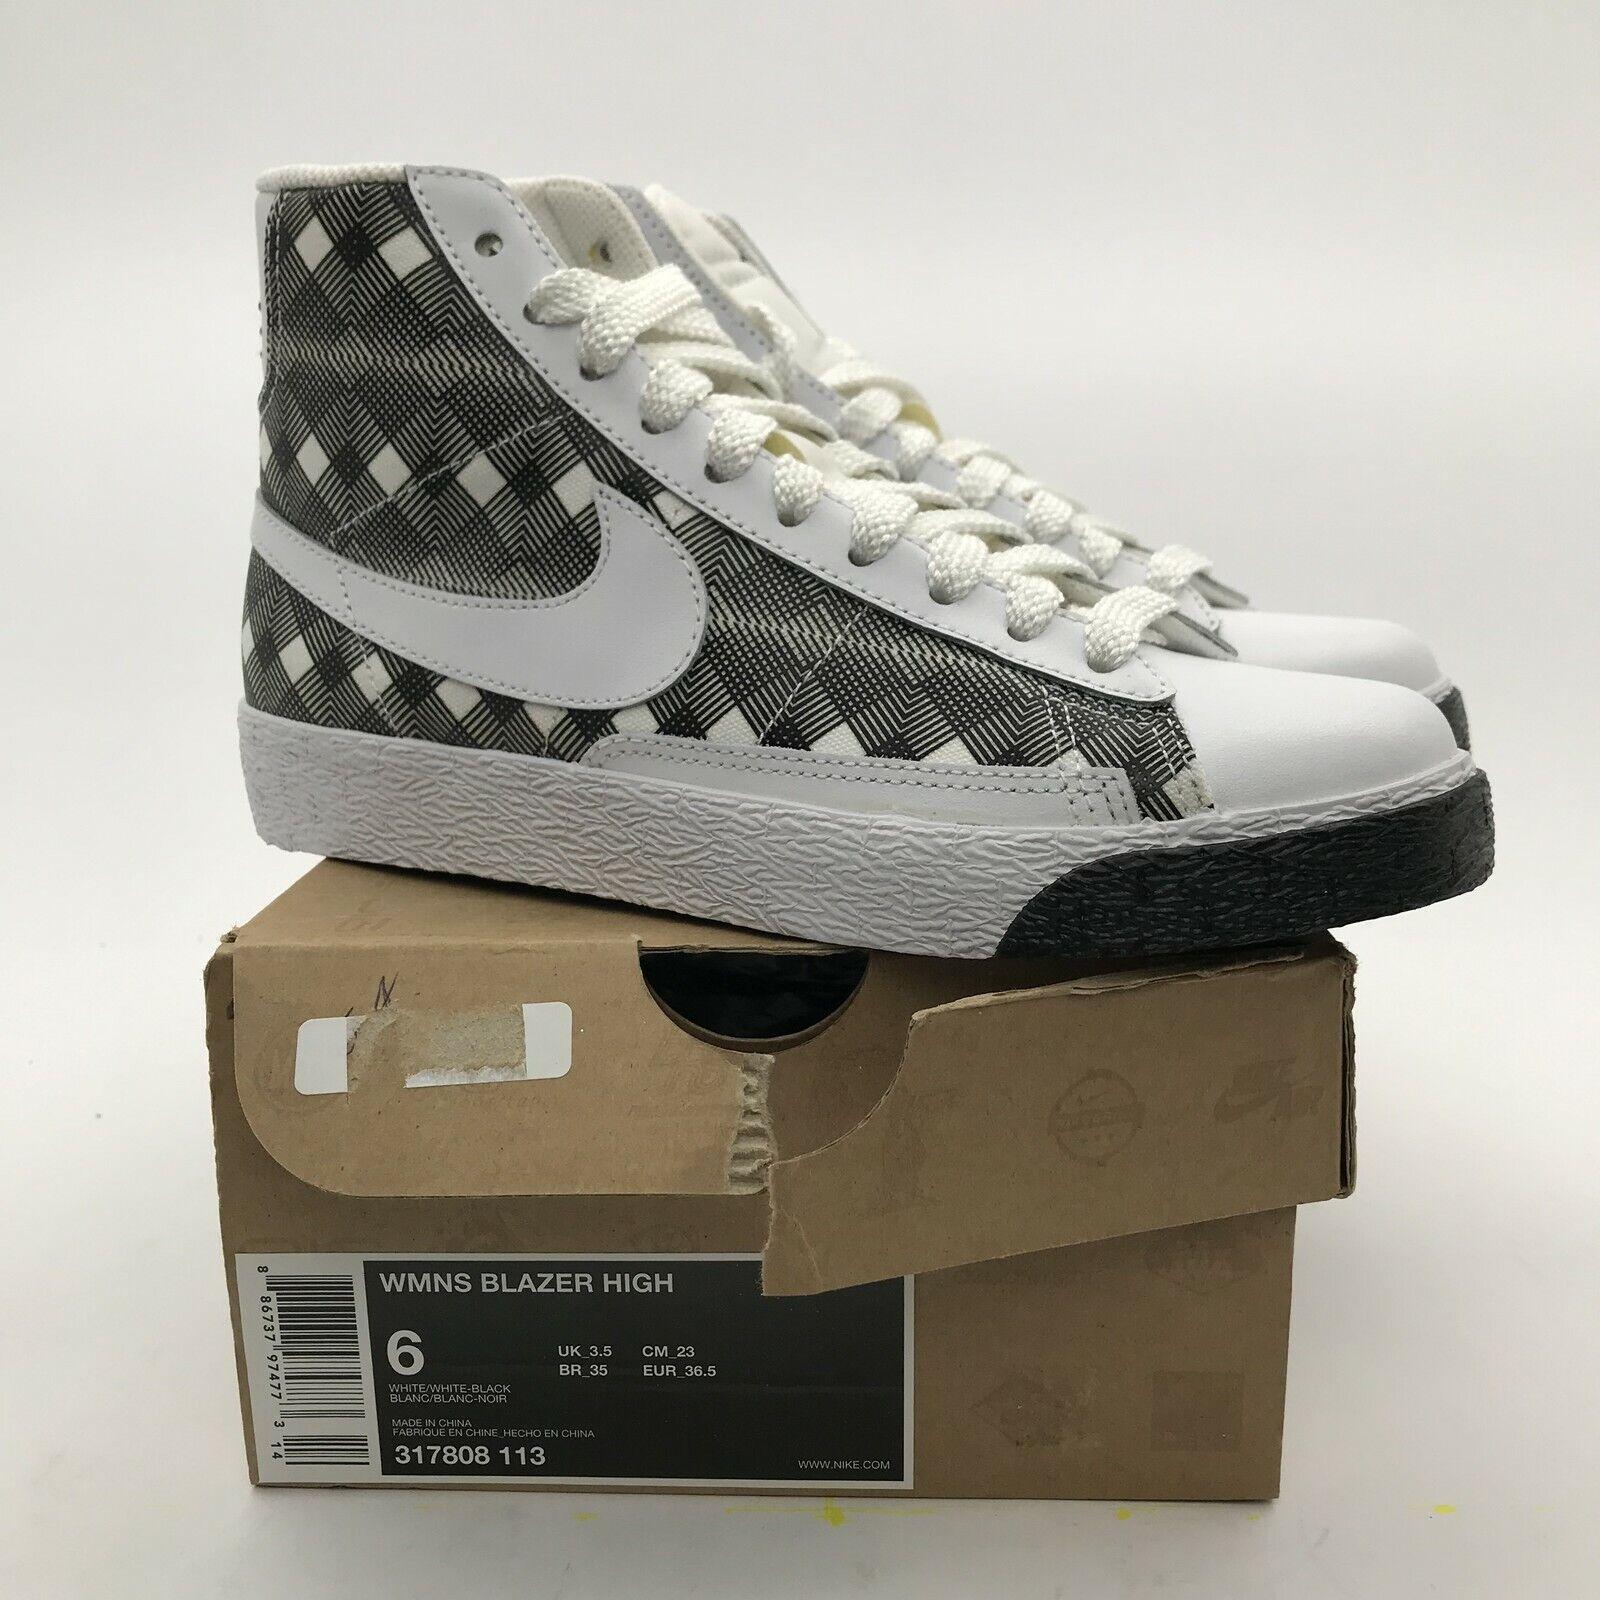 2008 Nike SB WMNS Blazer High White White Black Woven 317808-113 NEW rare US 6